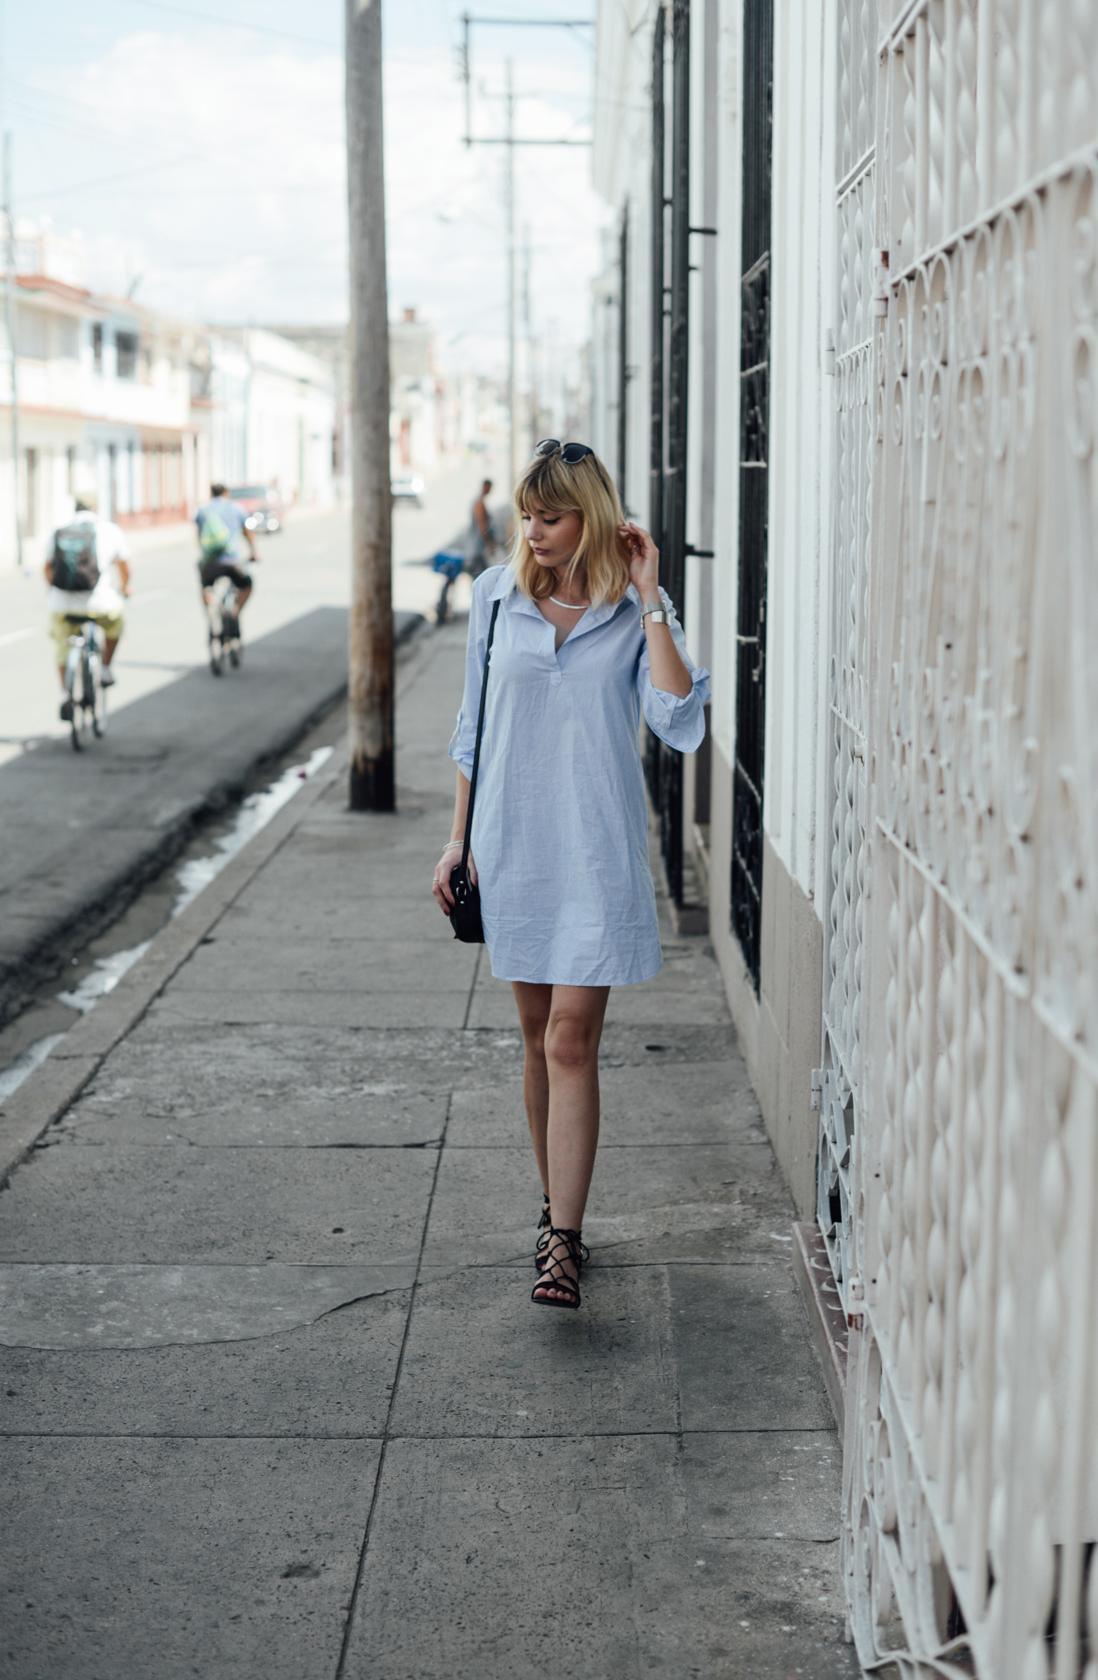 Kiamisu_Modeblog_Fashionblog_Alba Moda_Cienfuegos_Kuba Outfit Inspiration_Hemdkleid_final10